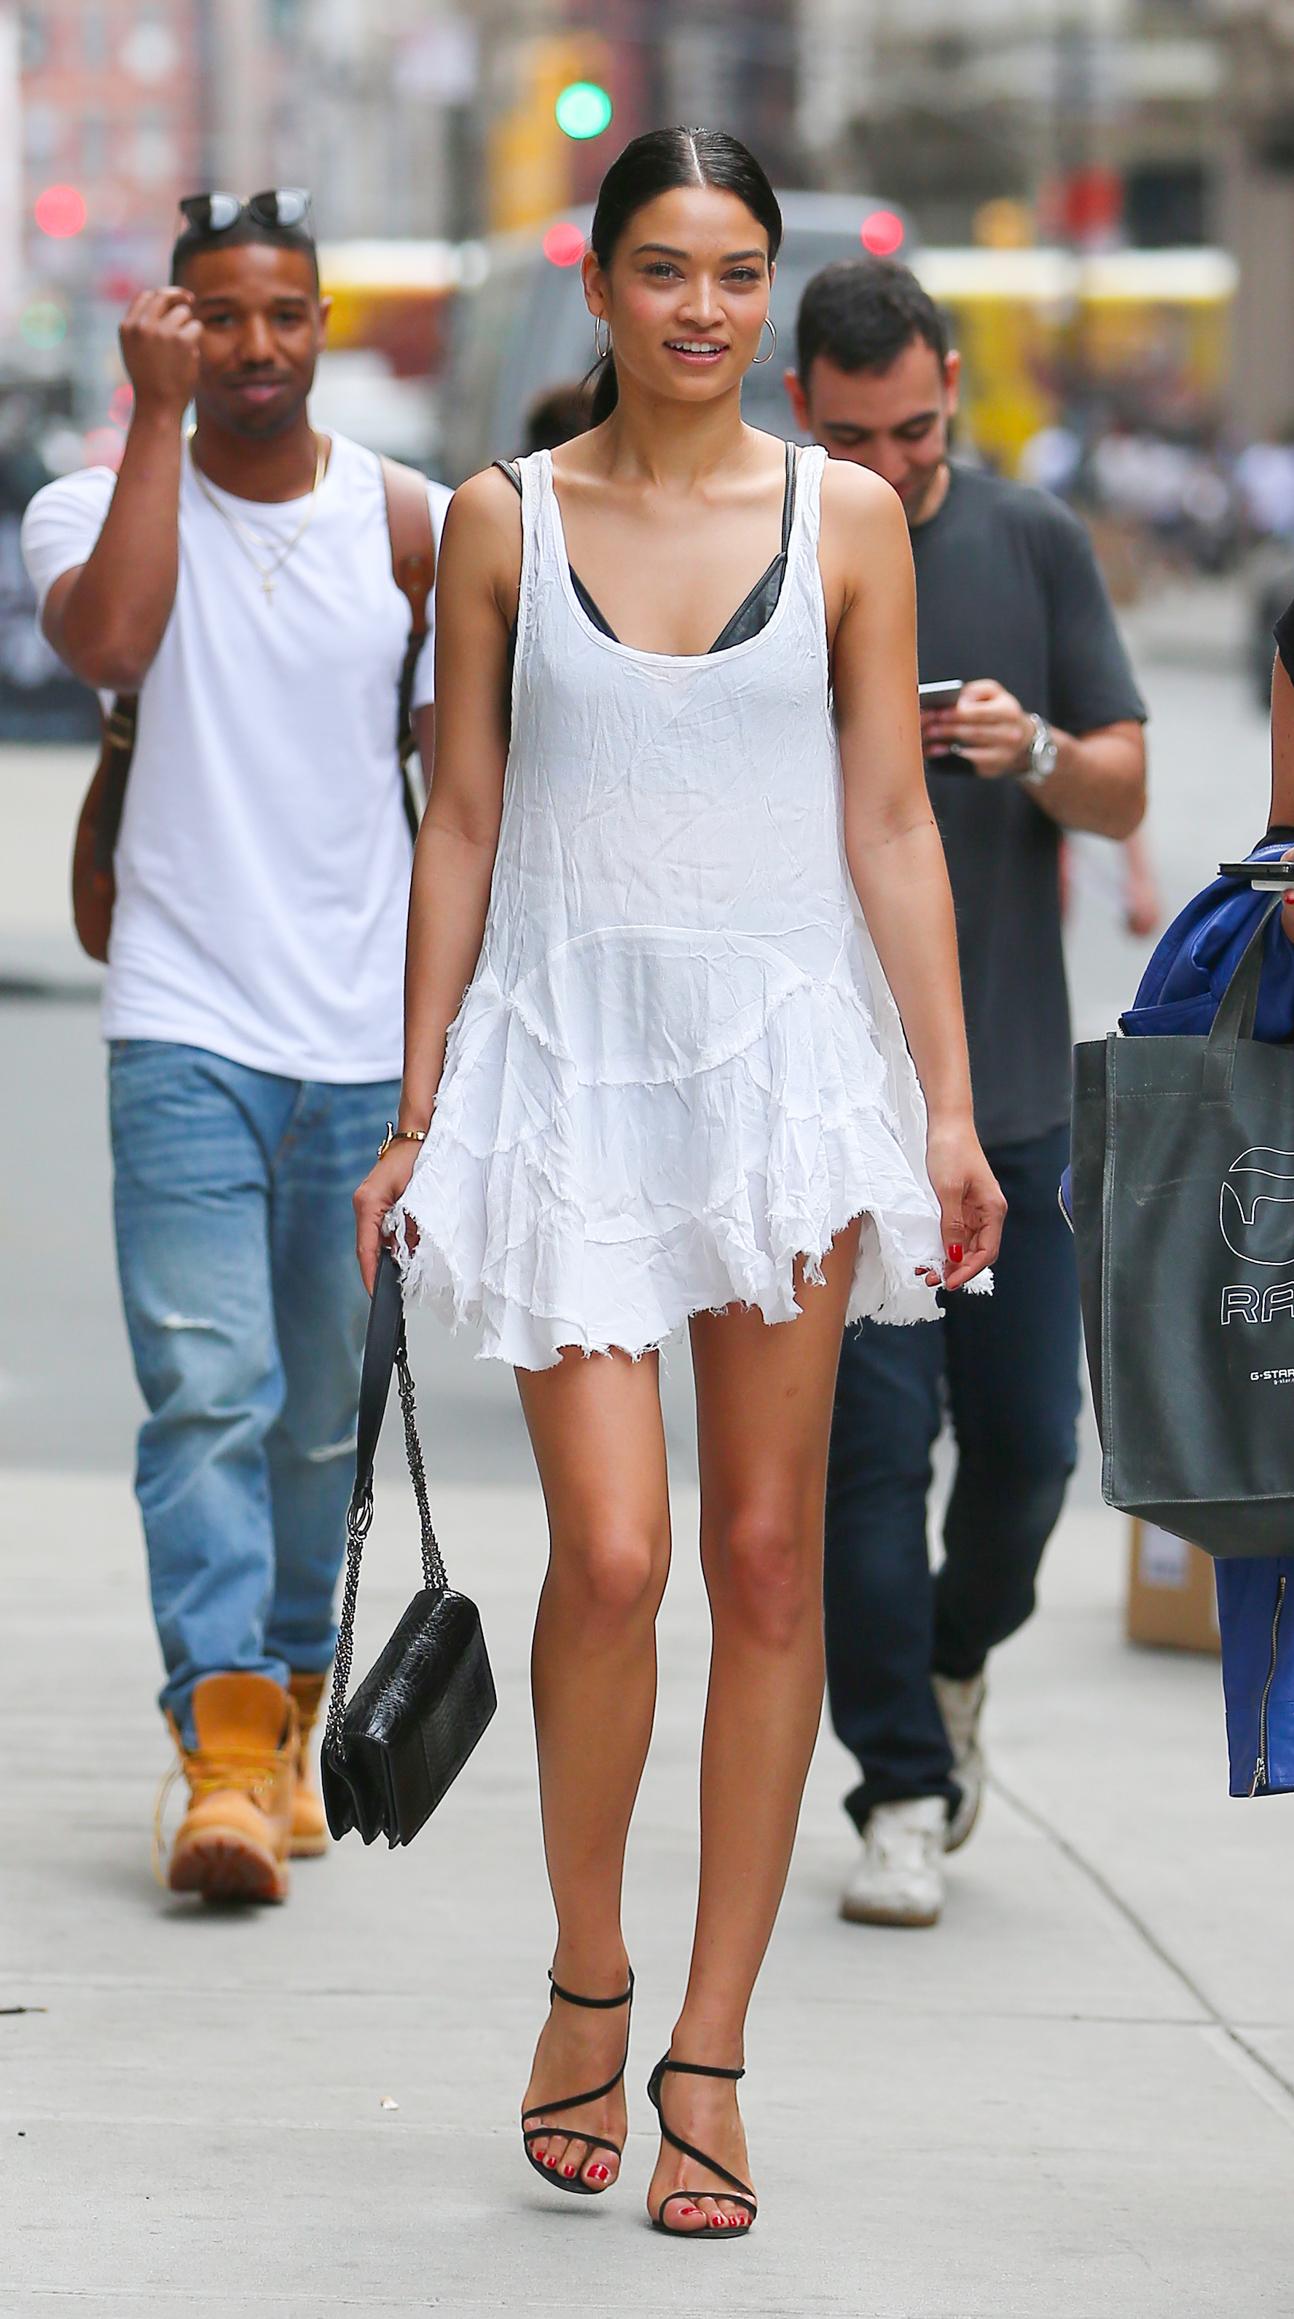 Shanina Shaik in Mini Dress Out in NYC